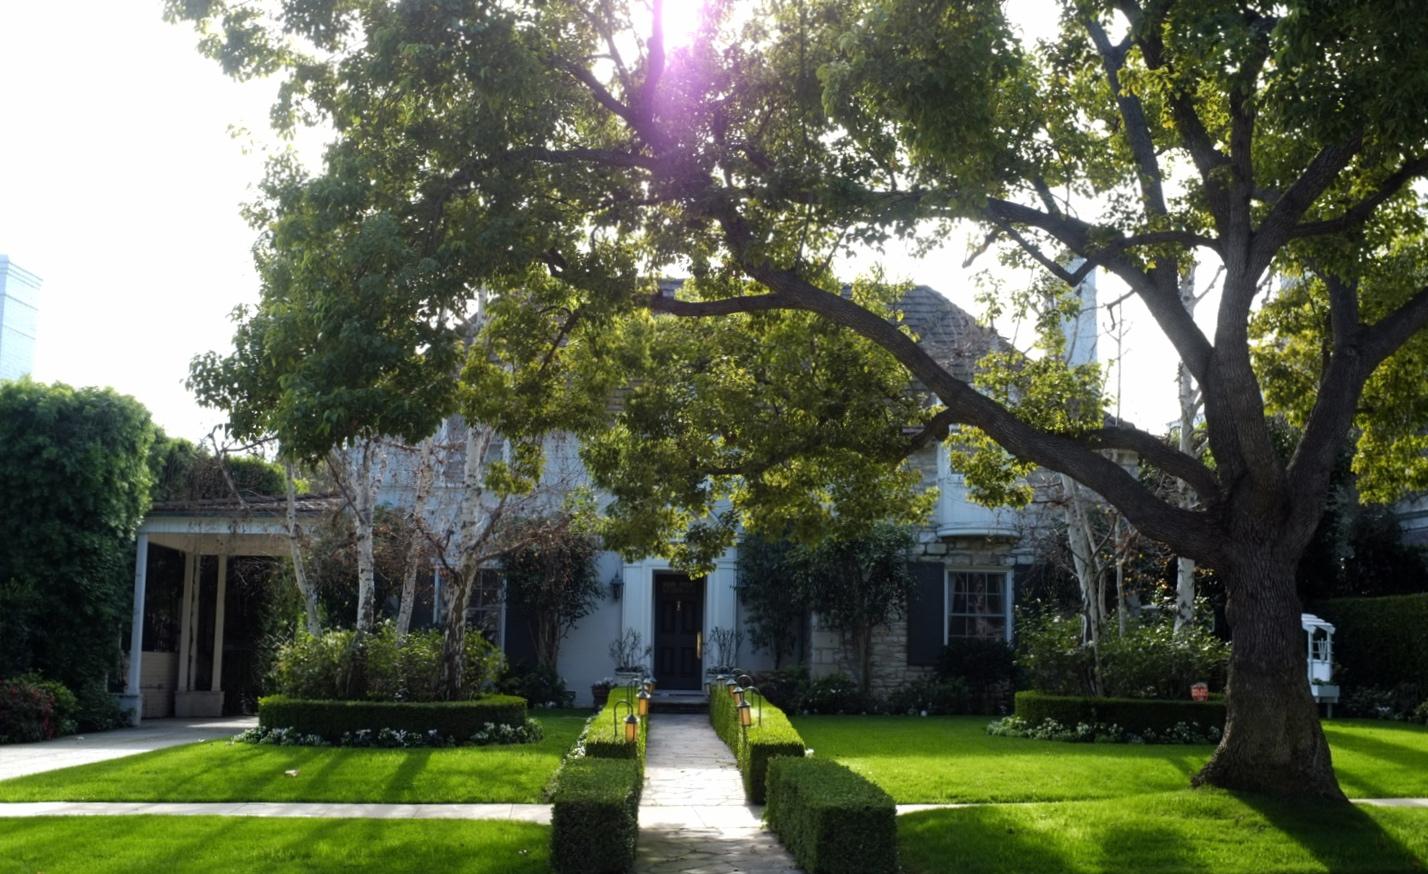 617 Trenton Ave, Beverly Hills